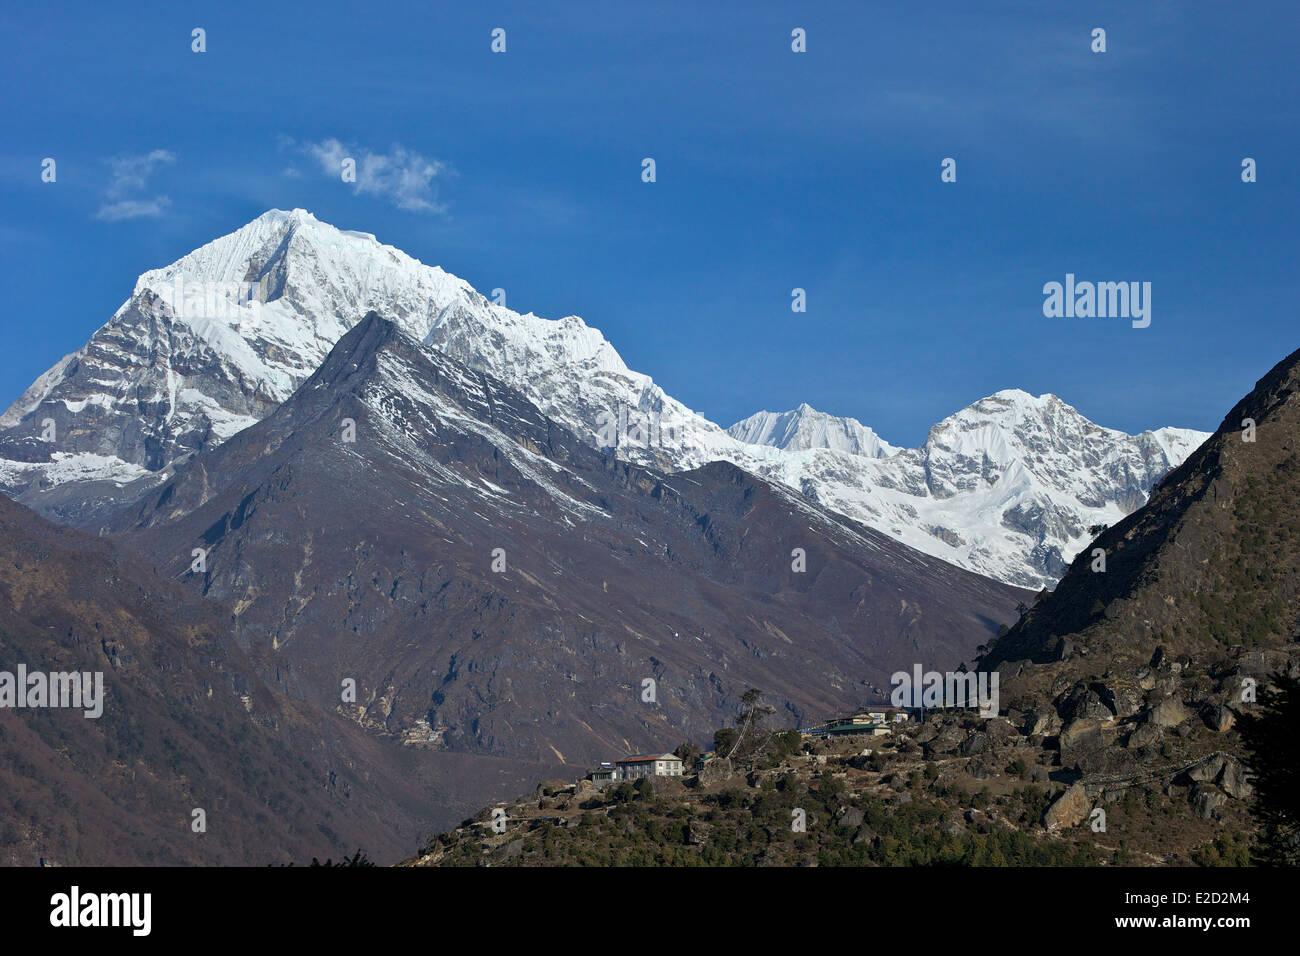 Sunder Peak taken from Namche Bazaar, Nepal, Asia - Stock Image